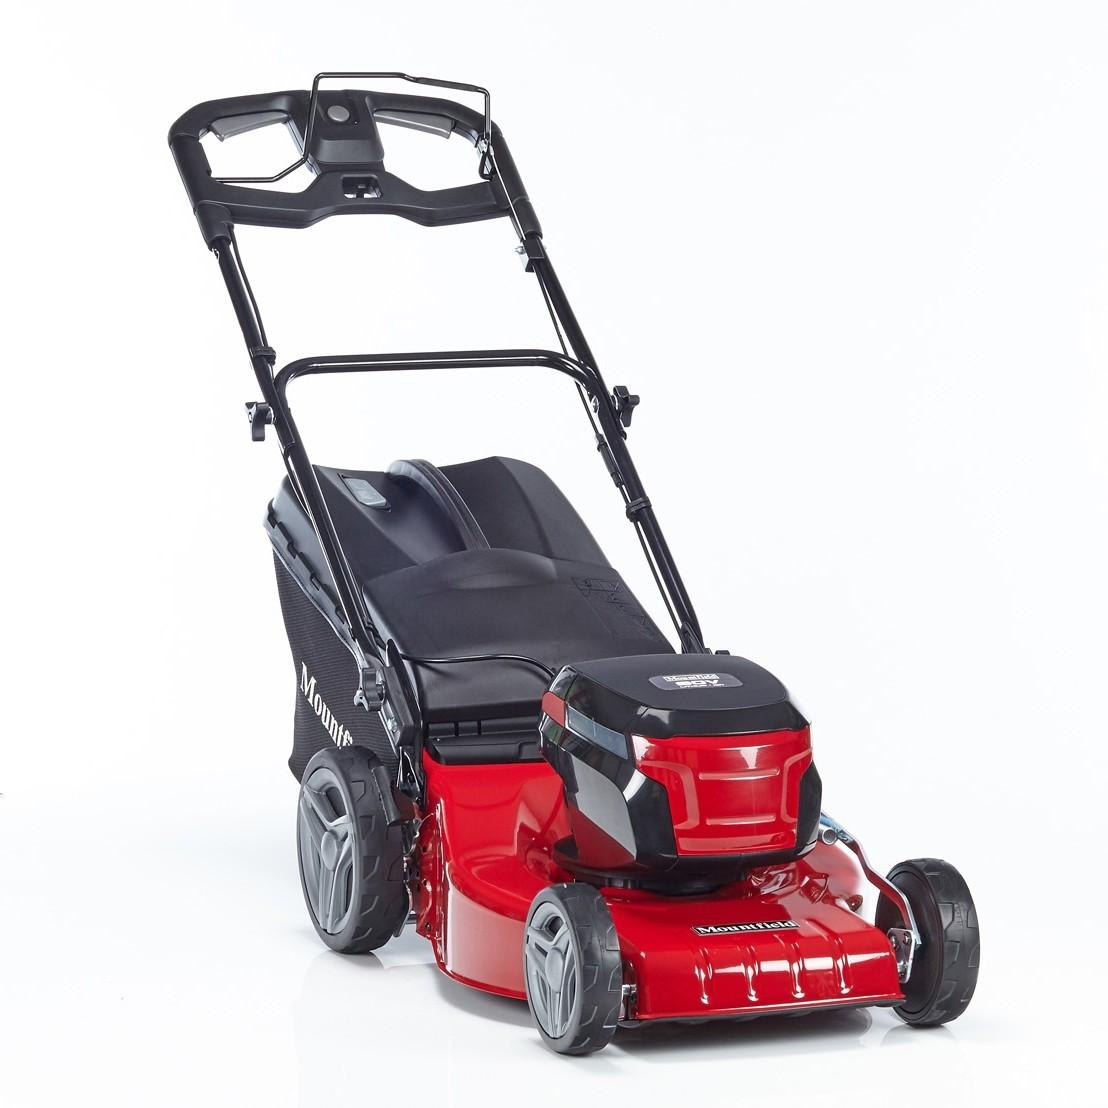 Mountfield S46PD Li 46cm cordless mower